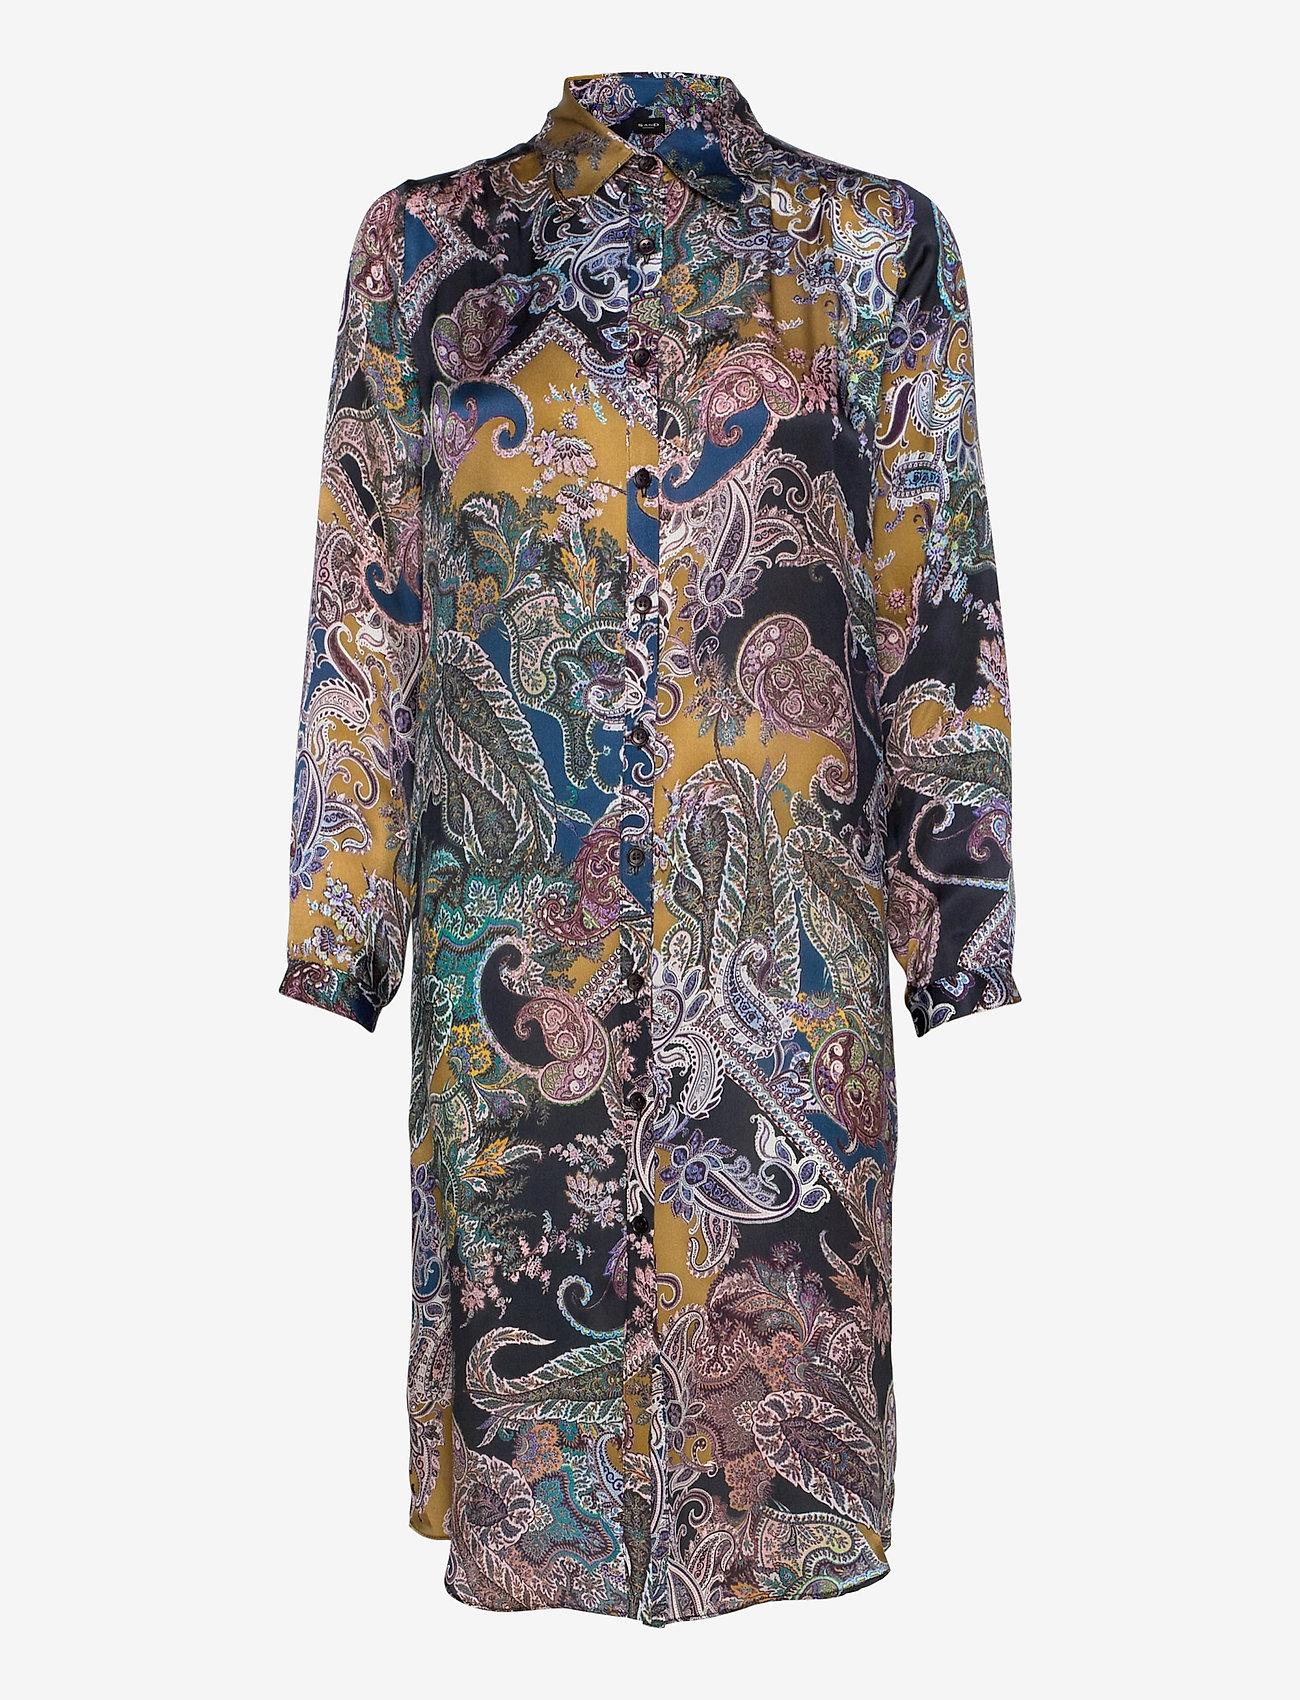 SAND - 3403 - Asia Dress - robes chemises - pattern - 0